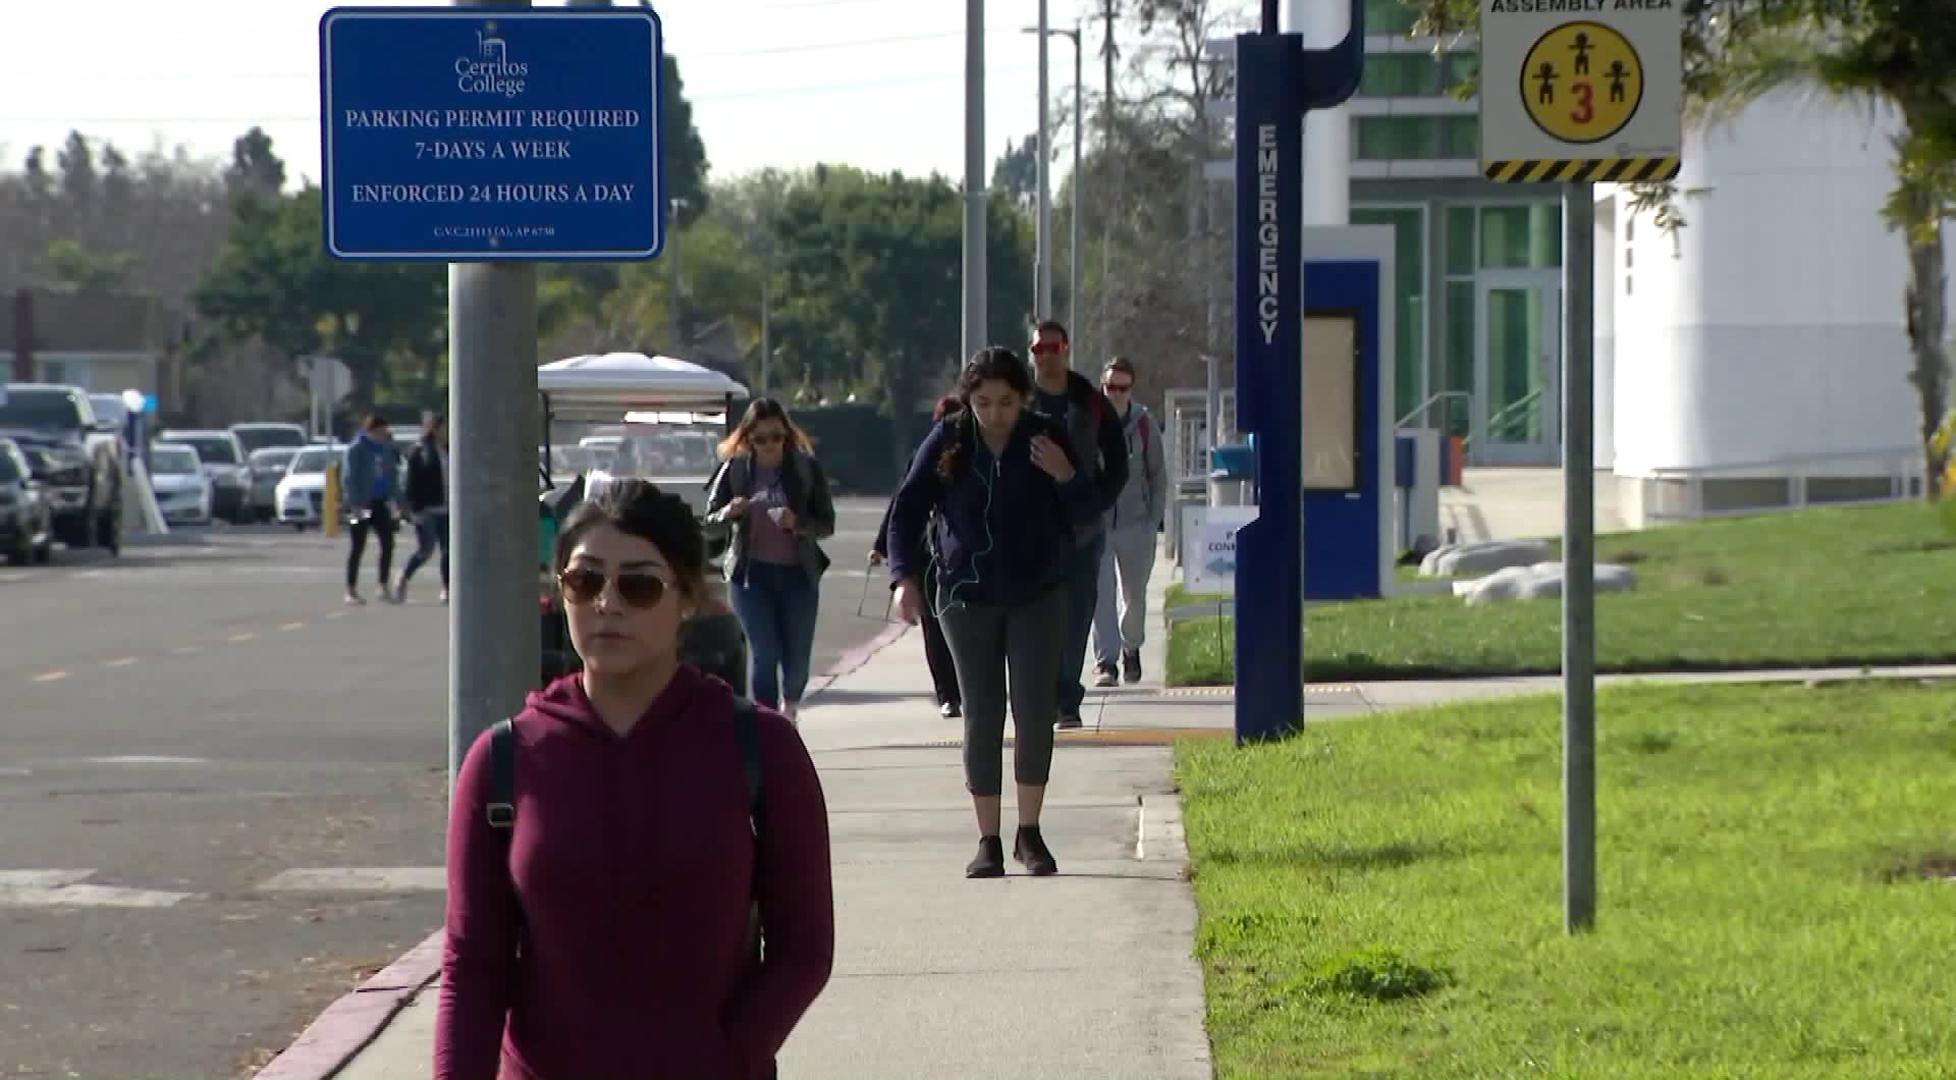 Students walk around Cerritos College in Norwalk on Feb. 12, 2019. (Credit: KTLA)